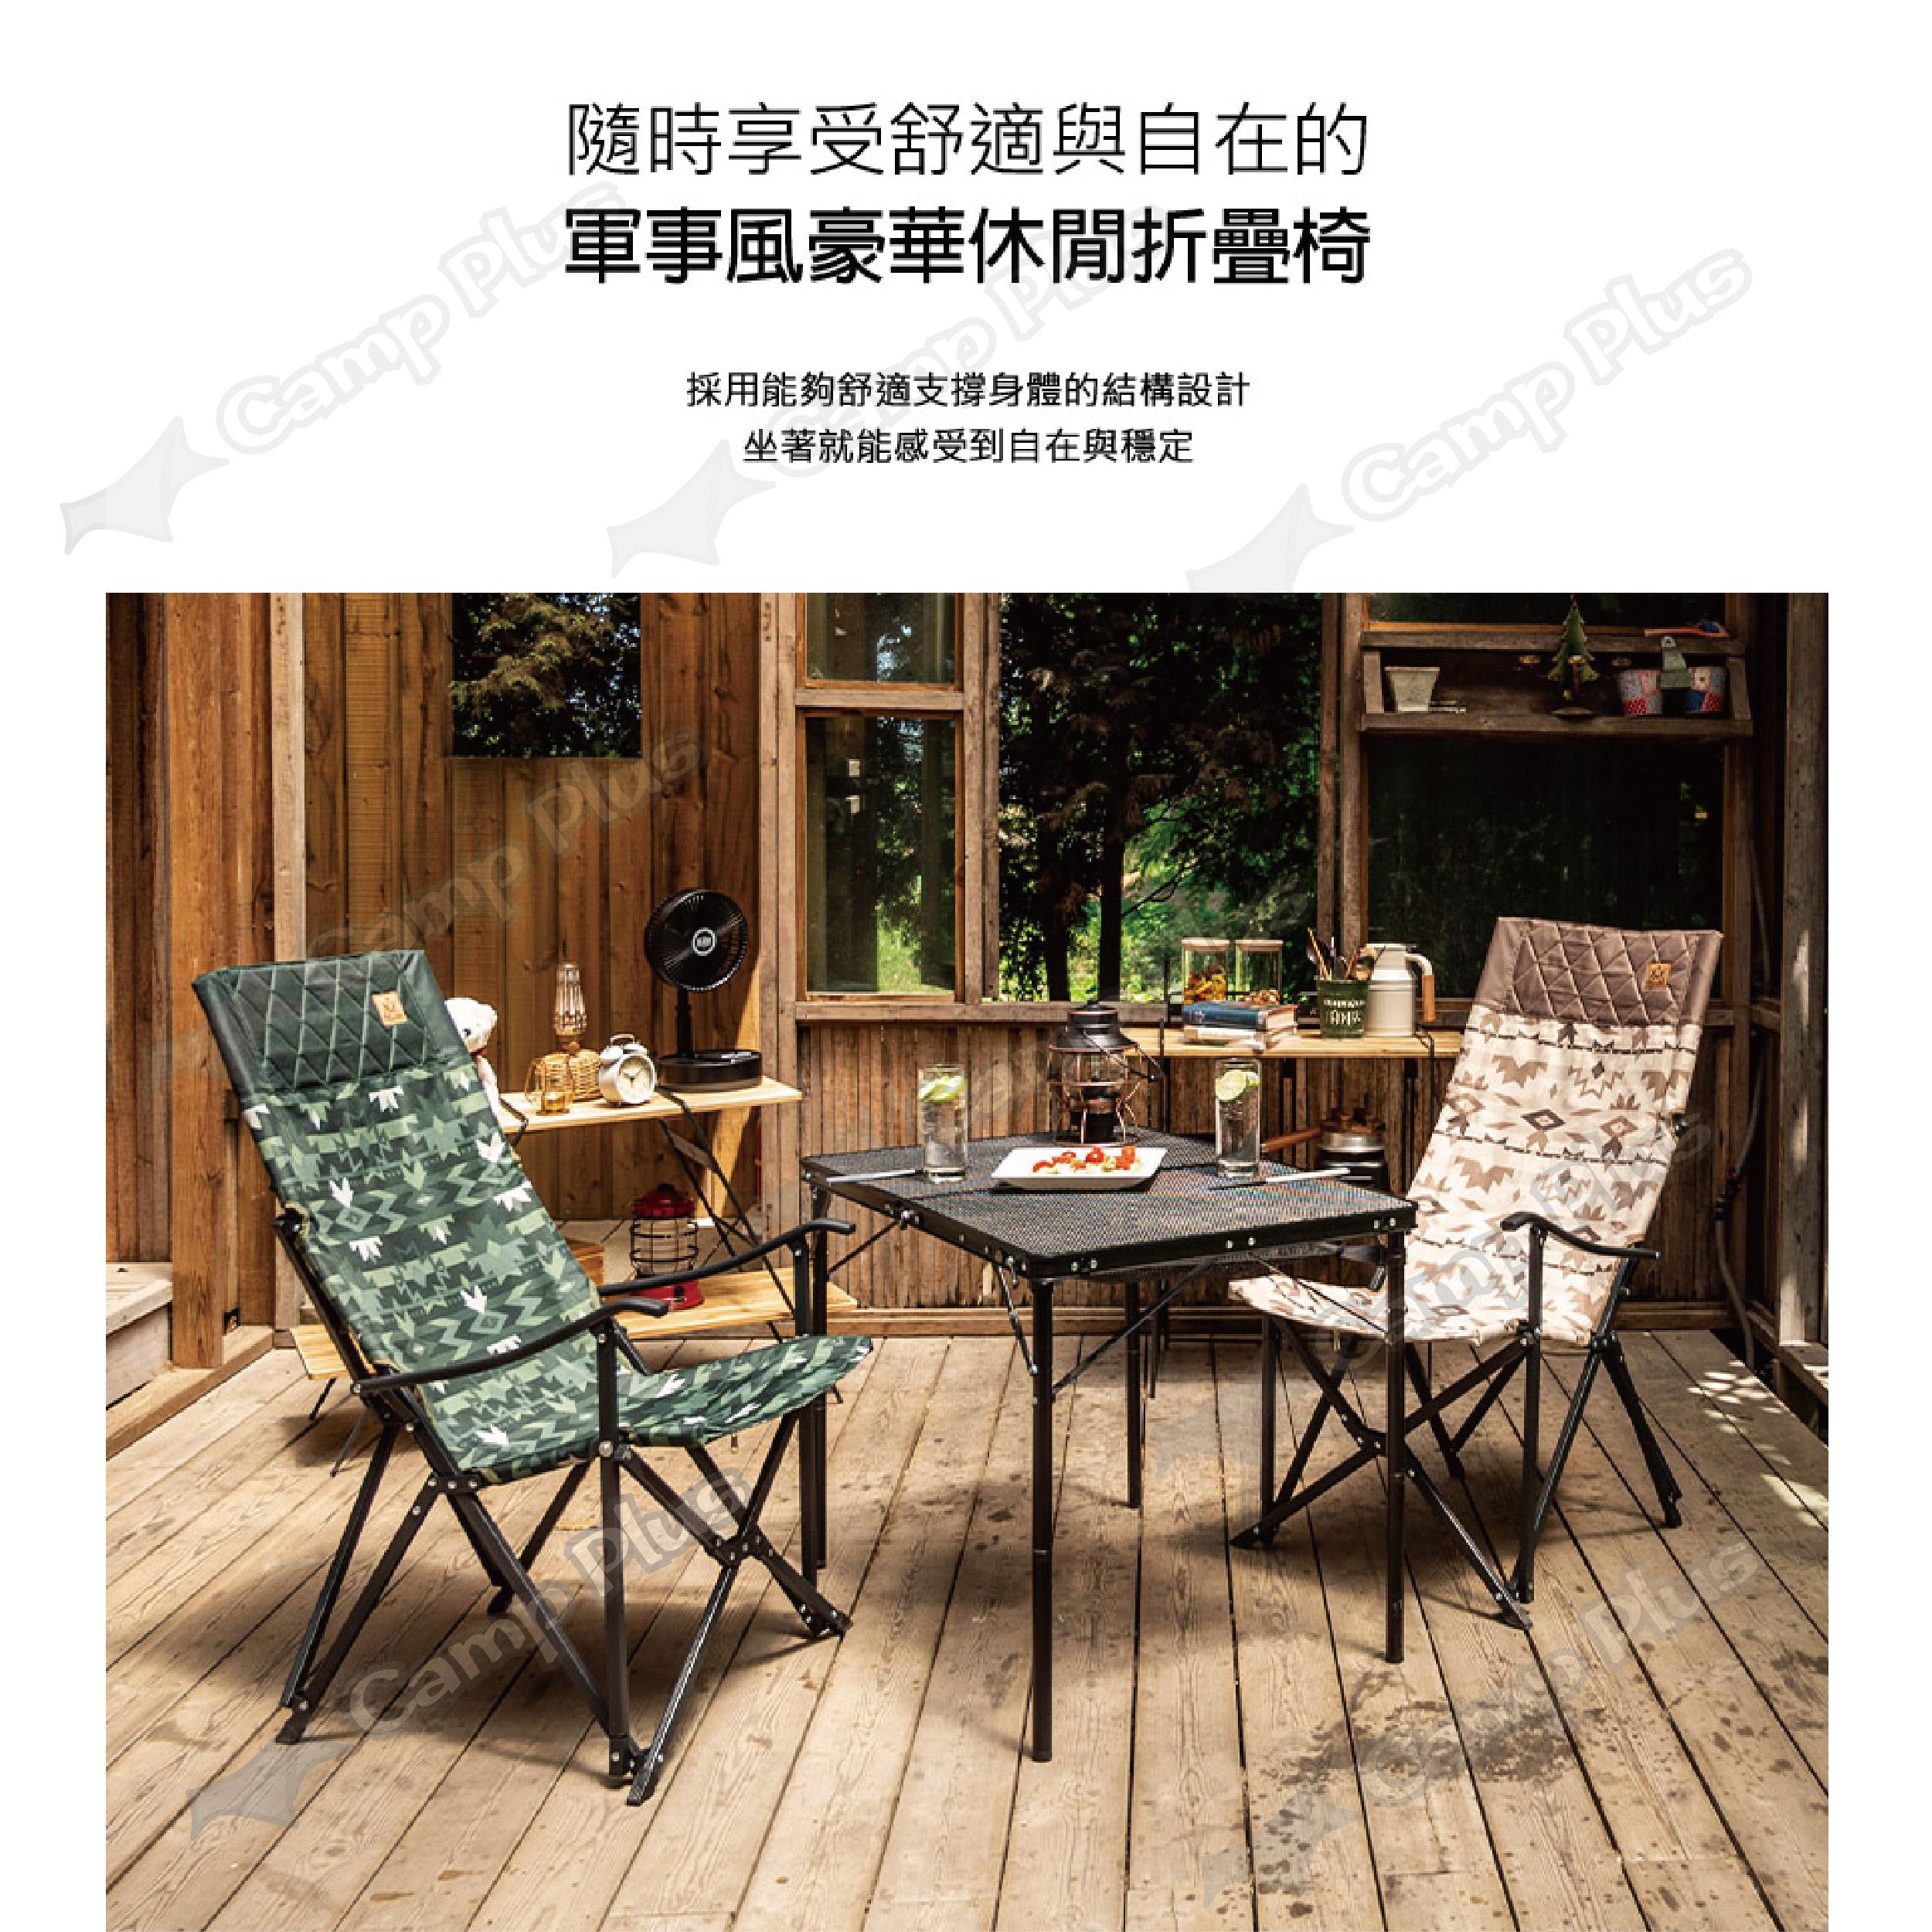 【KAZMI】軍事風豪華休閒折疊椅 沙漠/軍綠 耐重80kg 摺疊椅 露營隨身椅 露營椅 野餐 露營 悠遊戶外